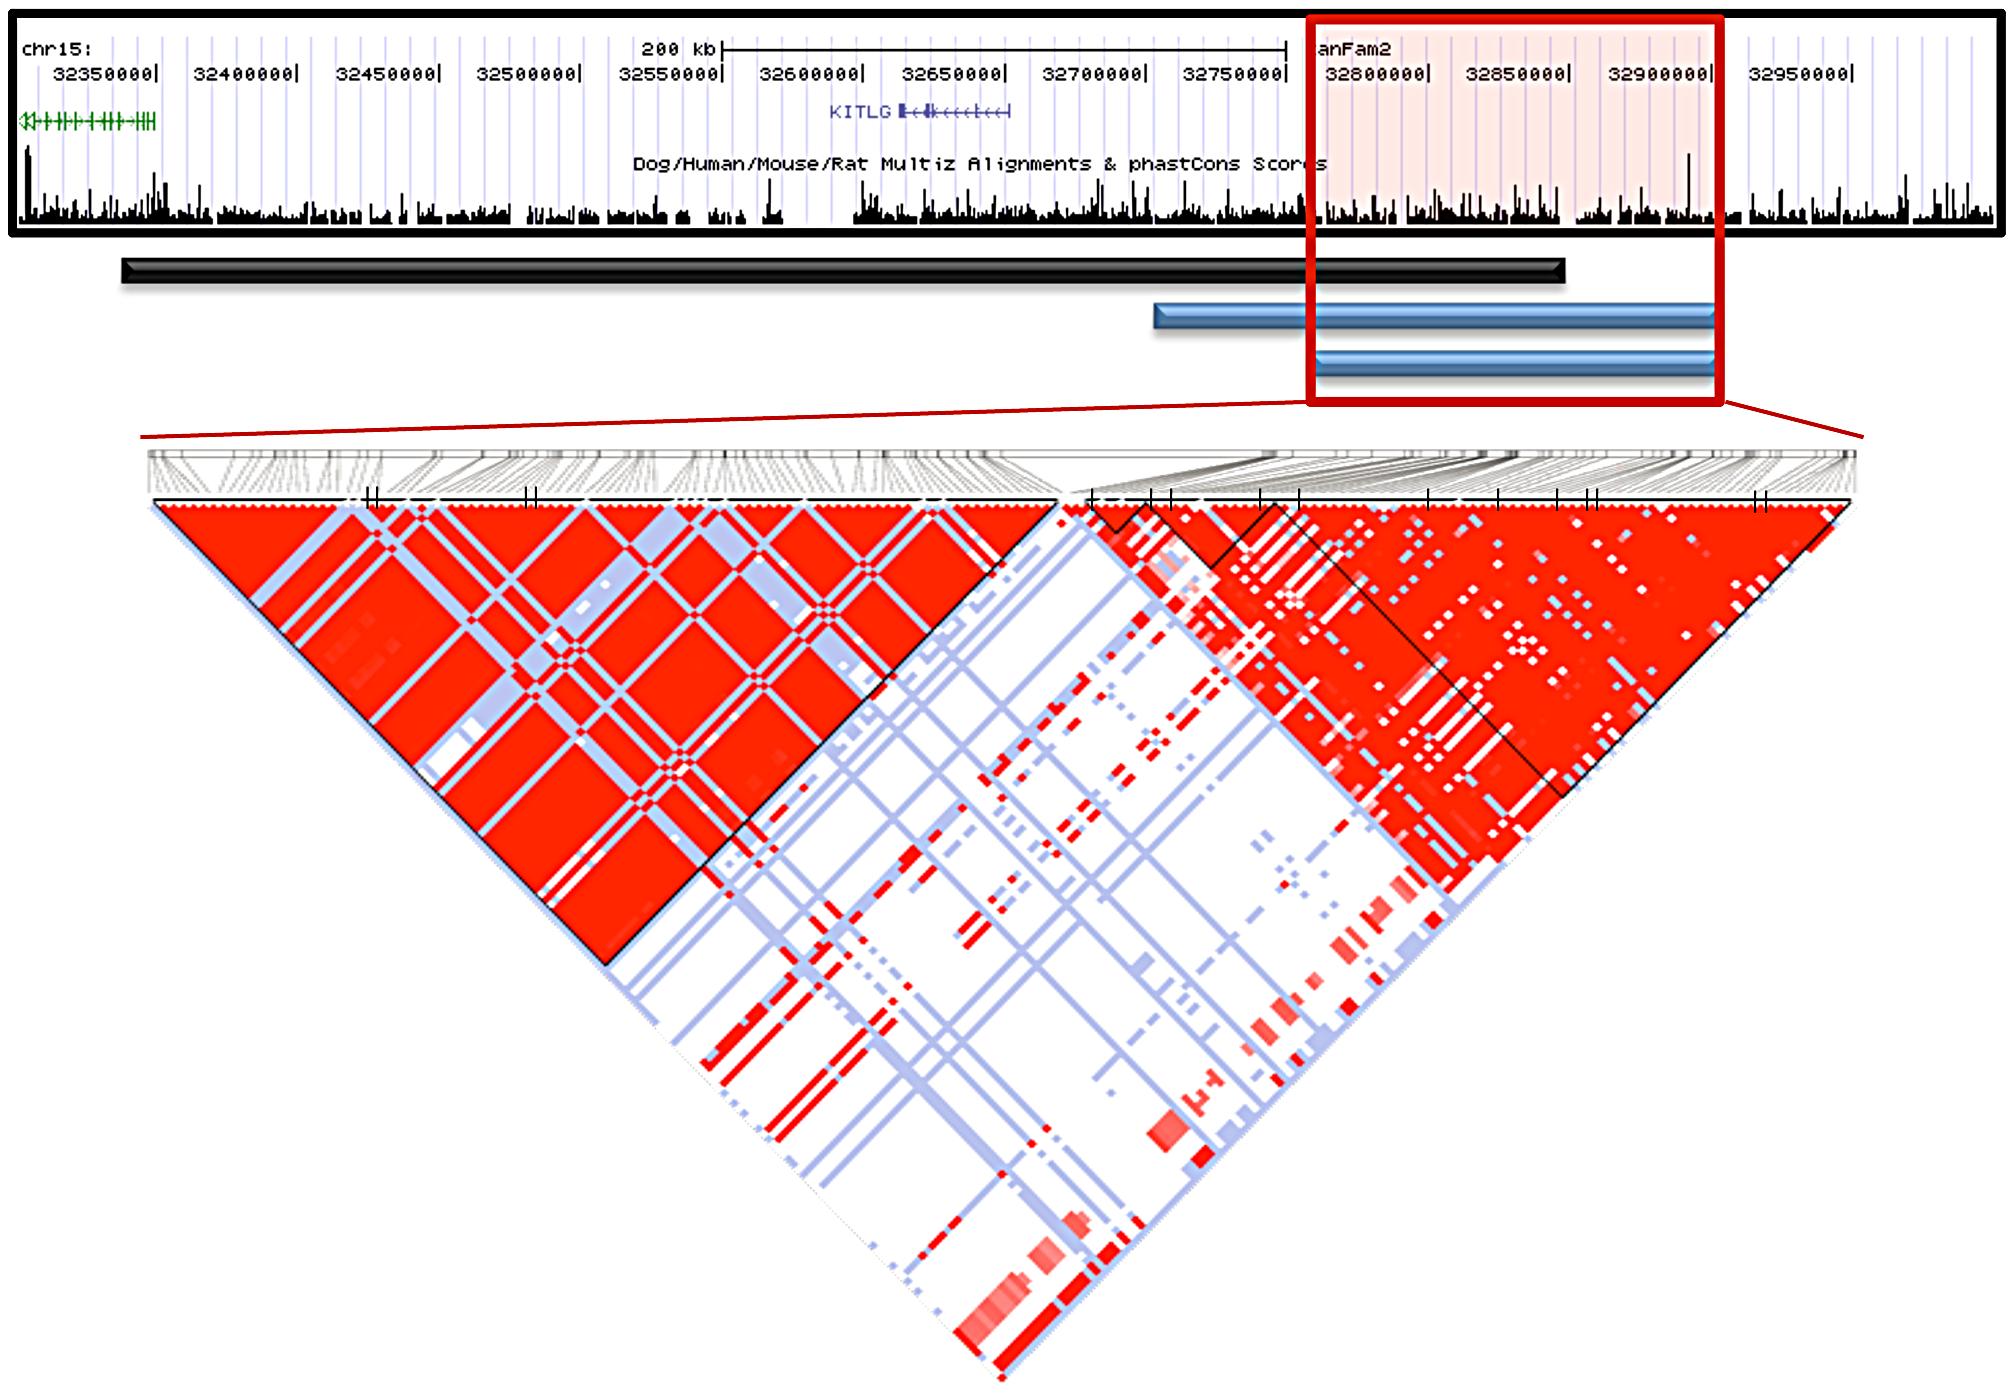 Interbreed haplotype analysis refines the SCCD locus to 144.9 Kb.